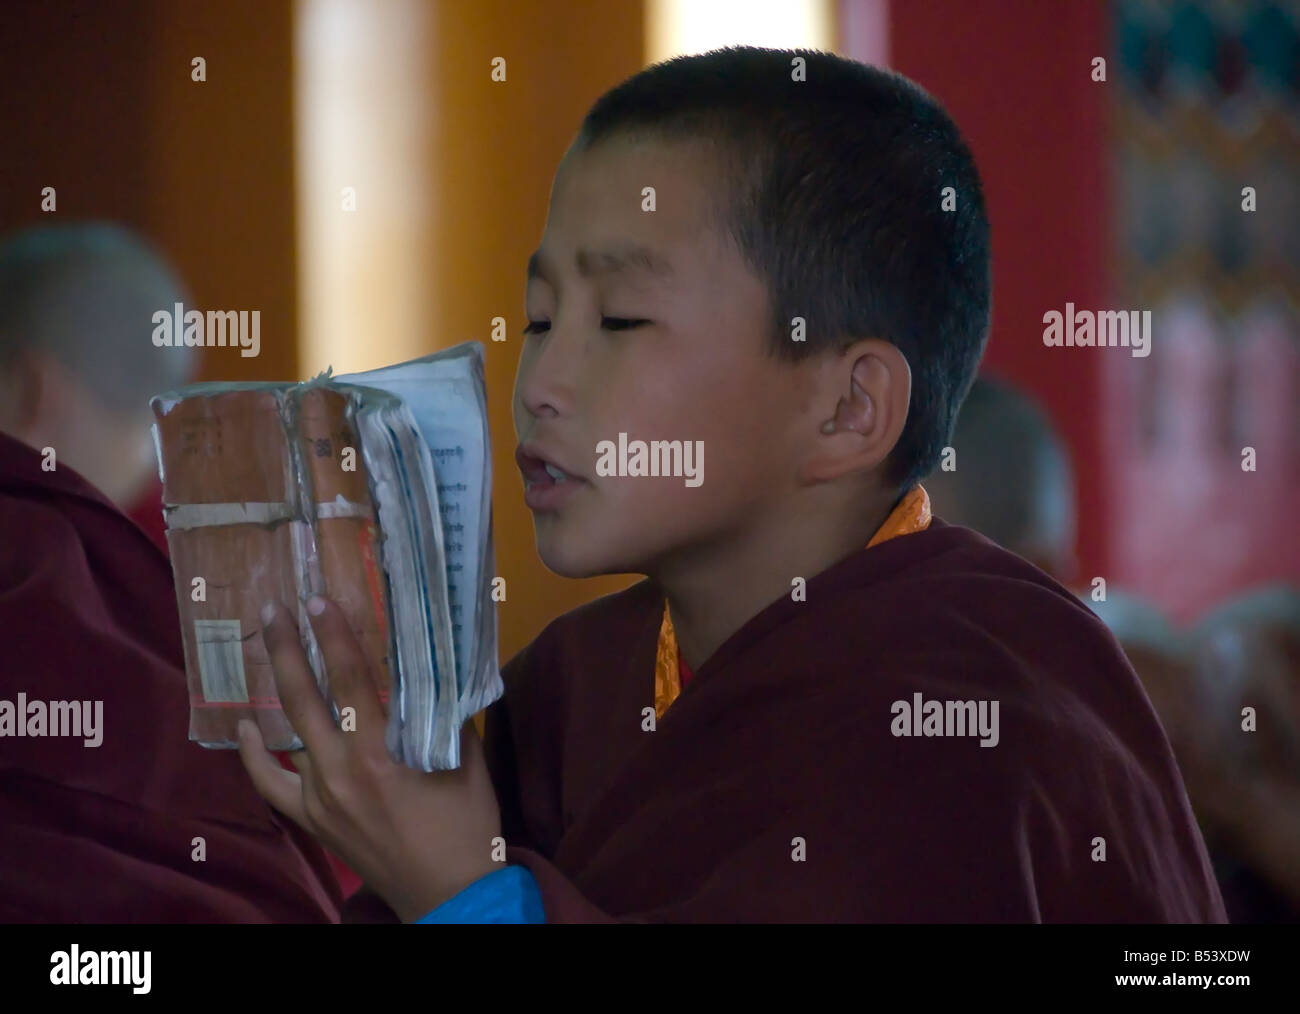 Young Buddhist Monk at the Gandan Khiid Monastery UlaanBaatar Mongolia - Stock Image